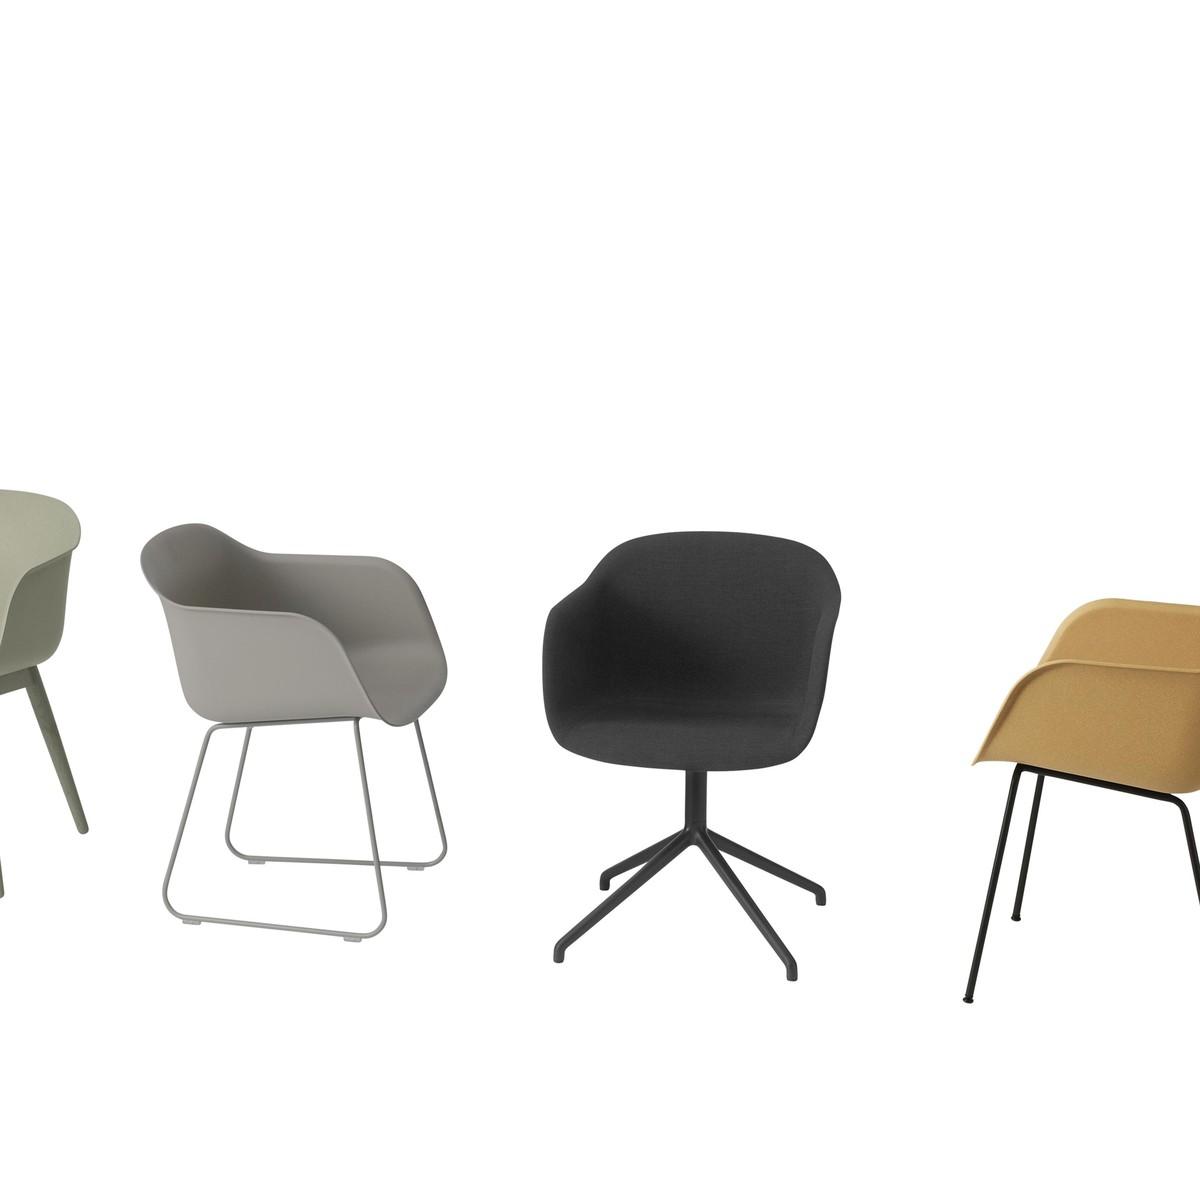 Fiber chair chaise pivotante muuto for Chaise pivotante